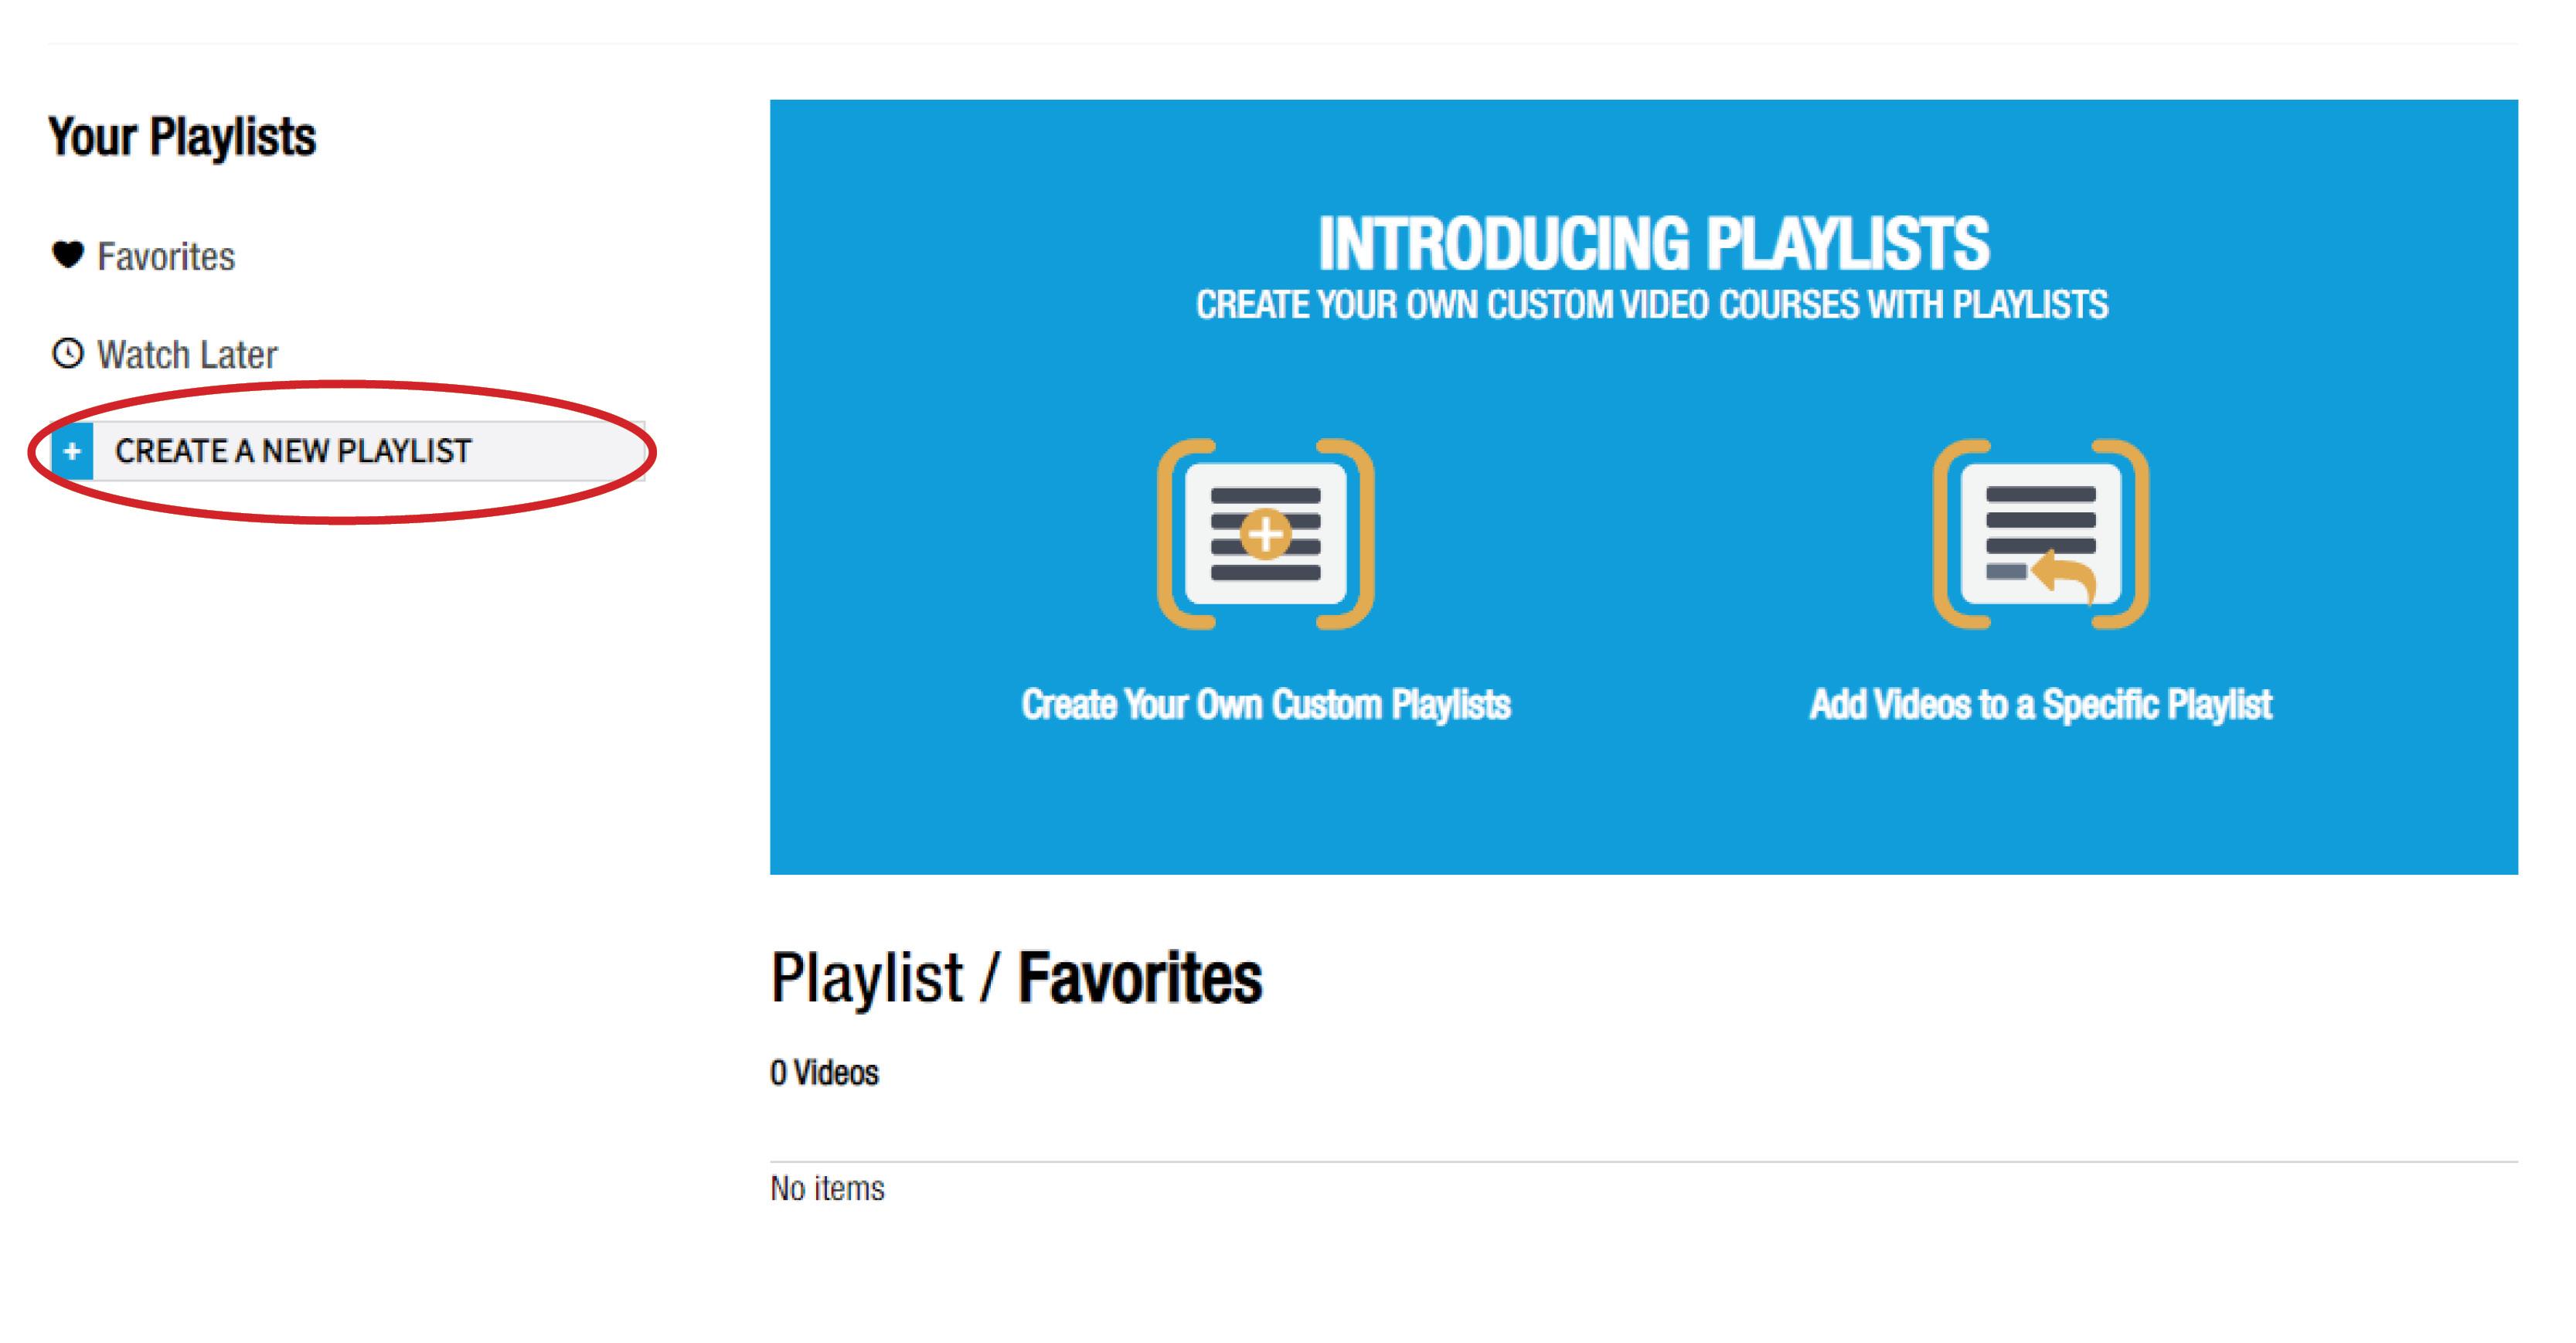 Create a Playlist